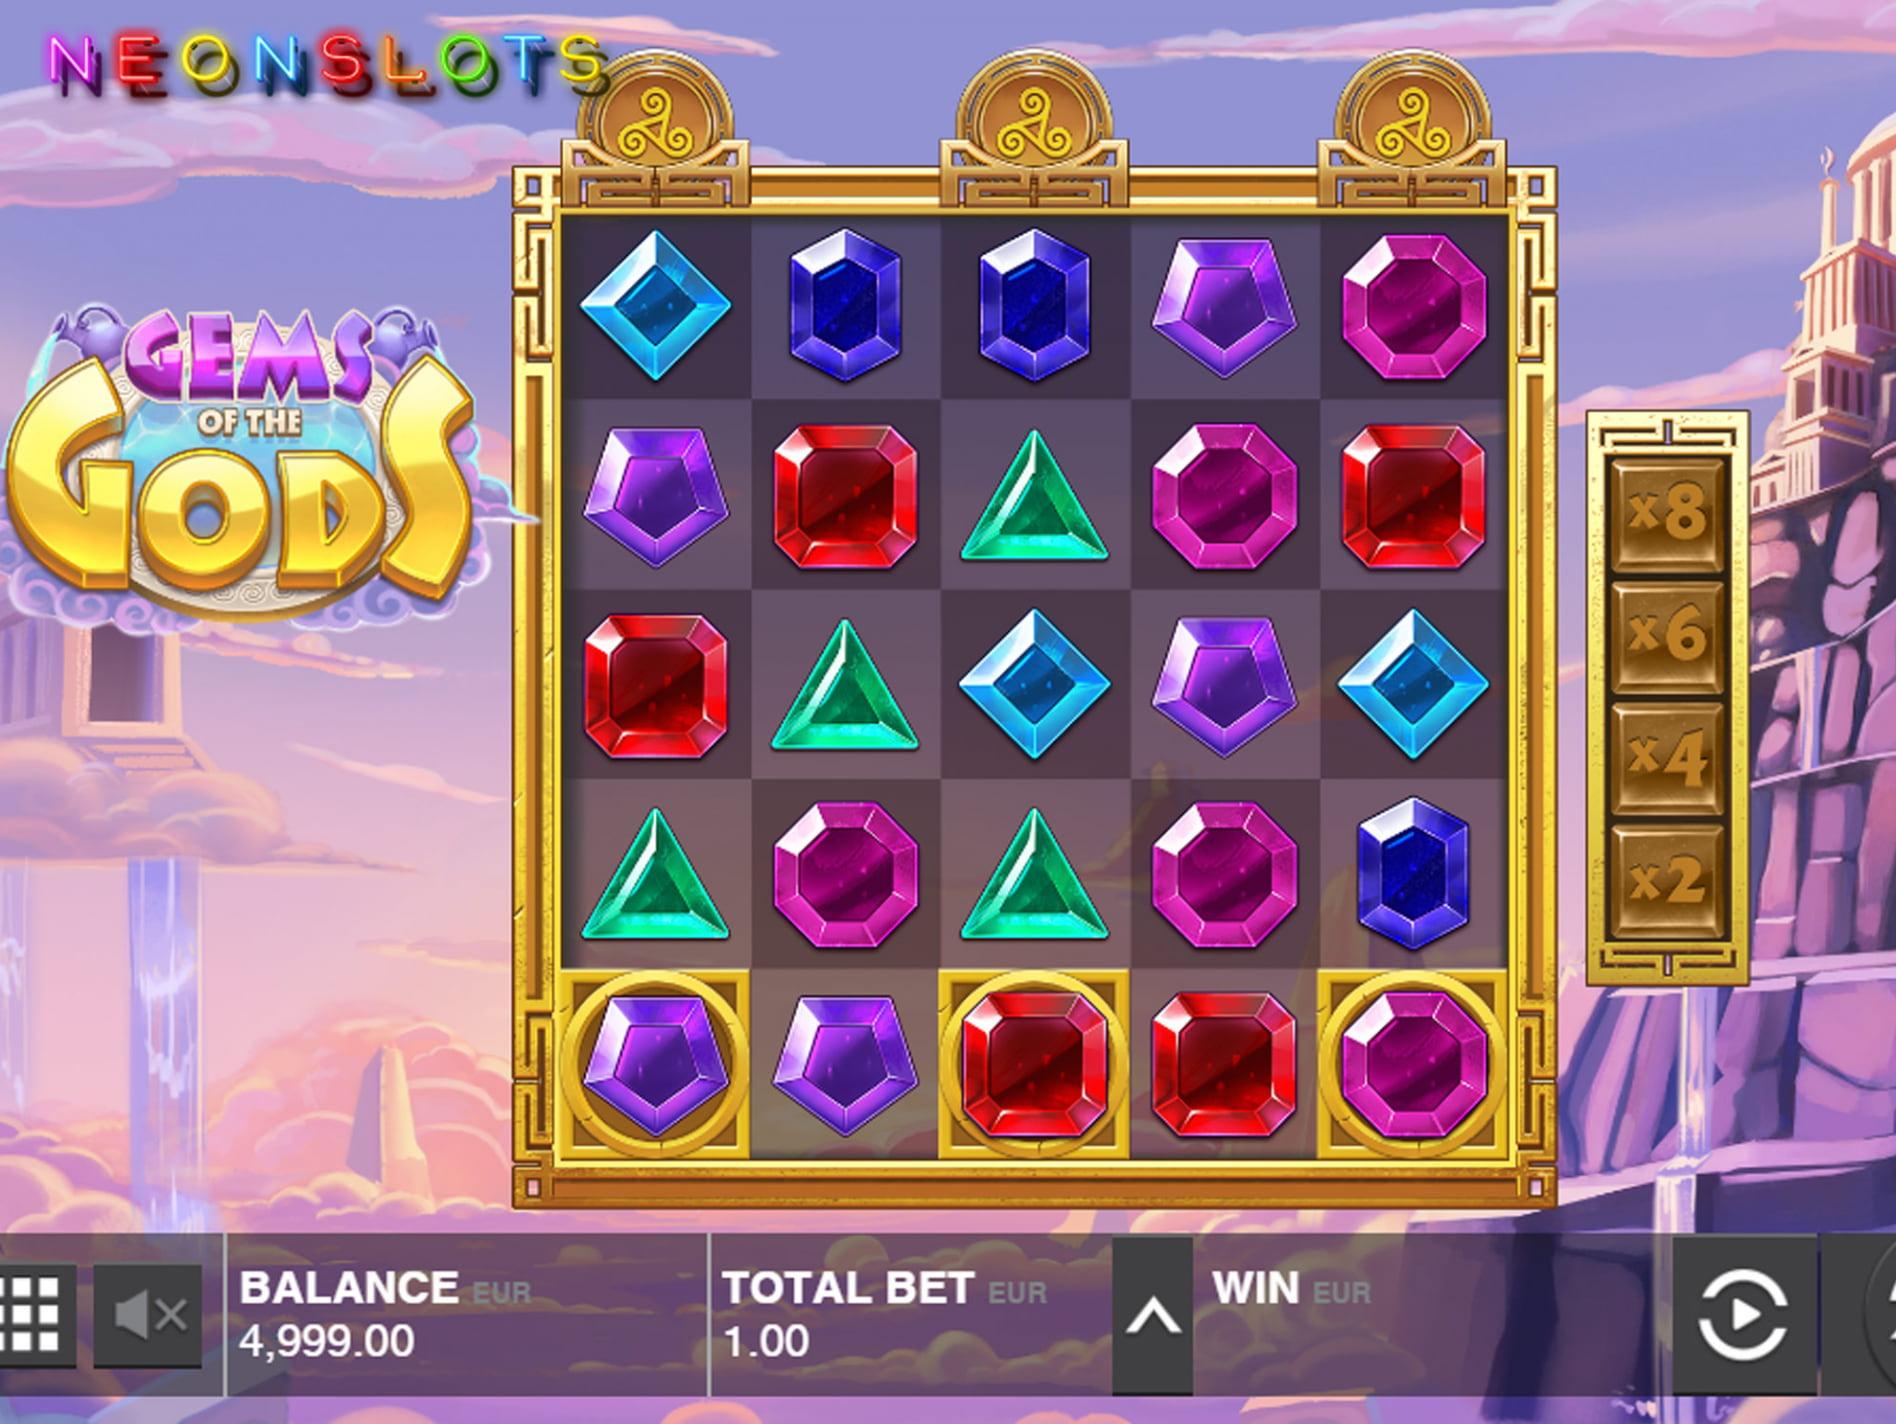 Tabla de ruleta giros Gratis casino Ecatepec - 94260